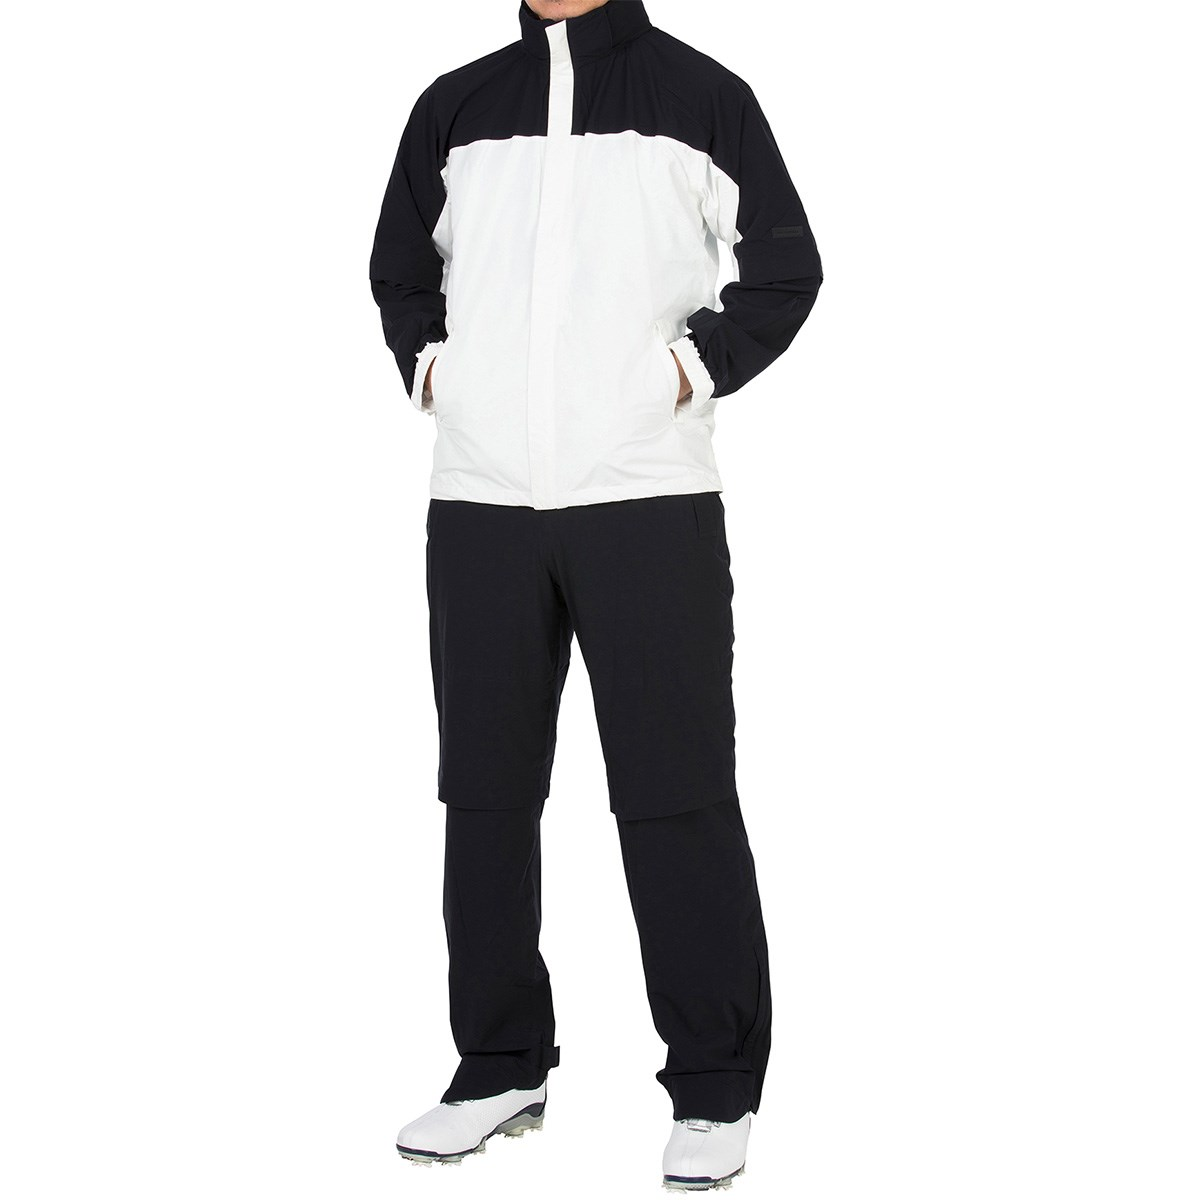 GDO オリジナル GDO ORIGINAL ストレッチ レインスーツ M ブラック/ホワイト/ブラック